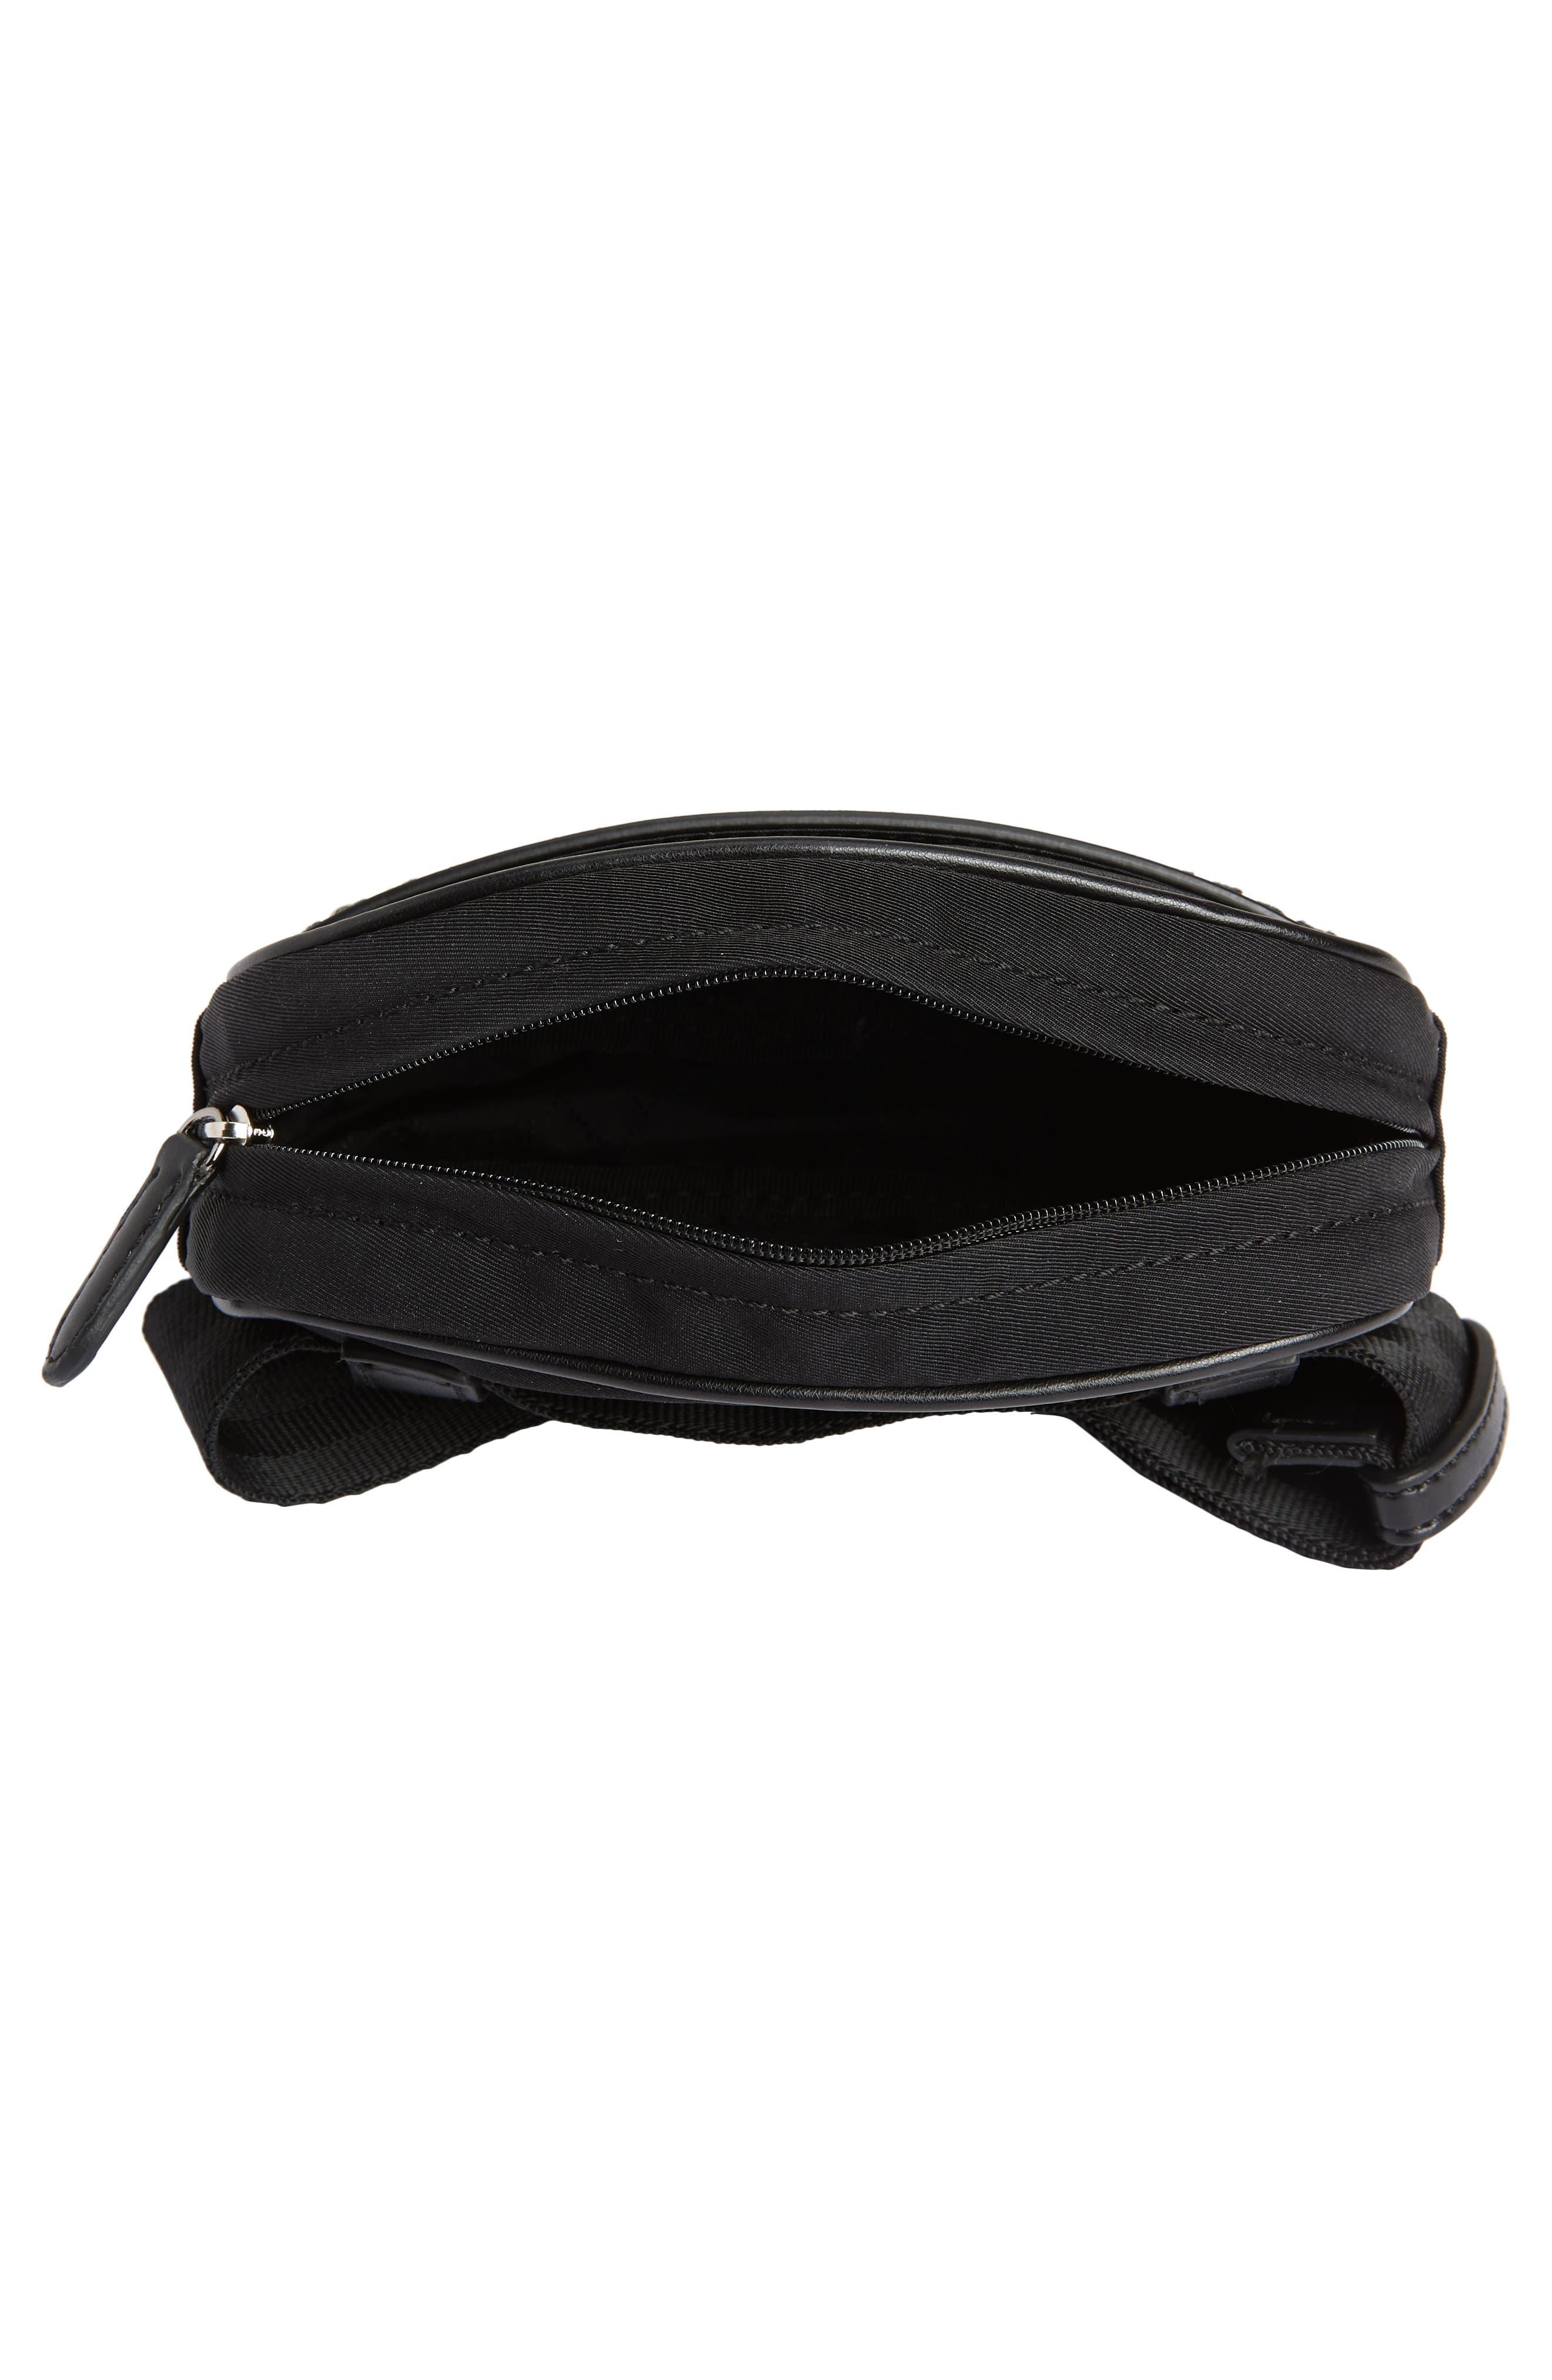 Nylon Convertible Belt Bag,                             Alternate thumbnail 5, color,                             BLACK/ SILVER